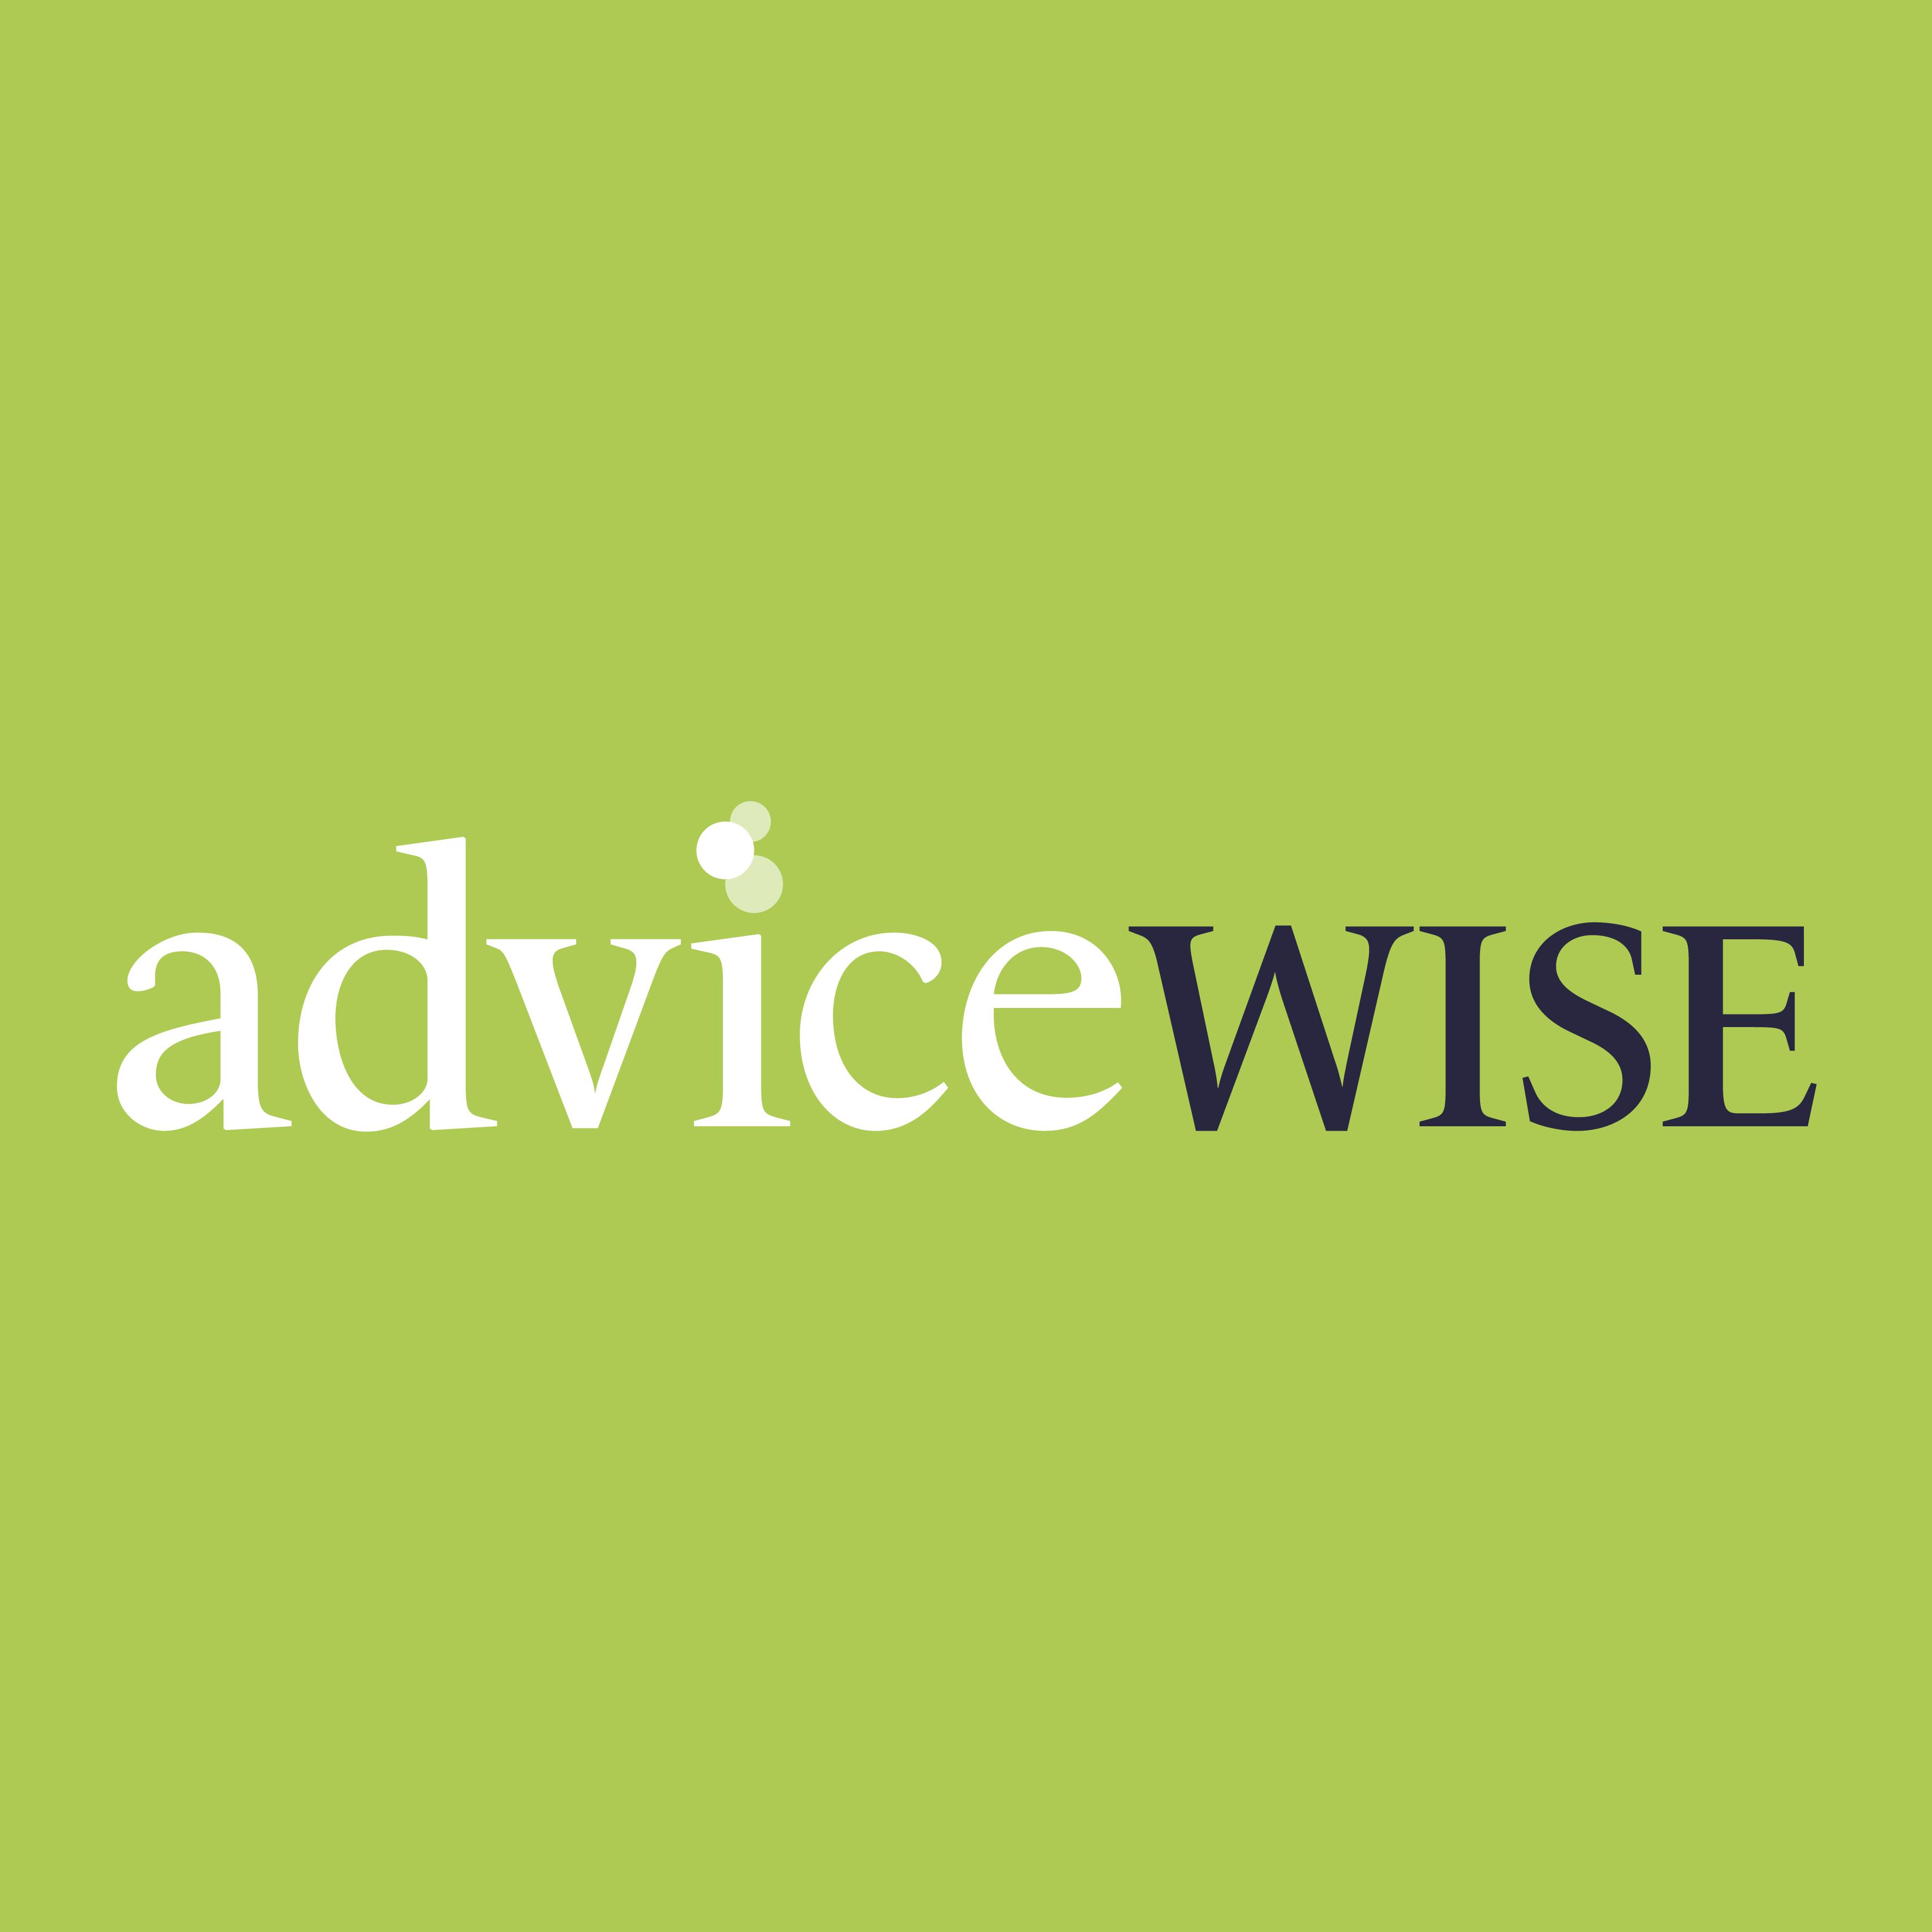 Advice Wise Ltd